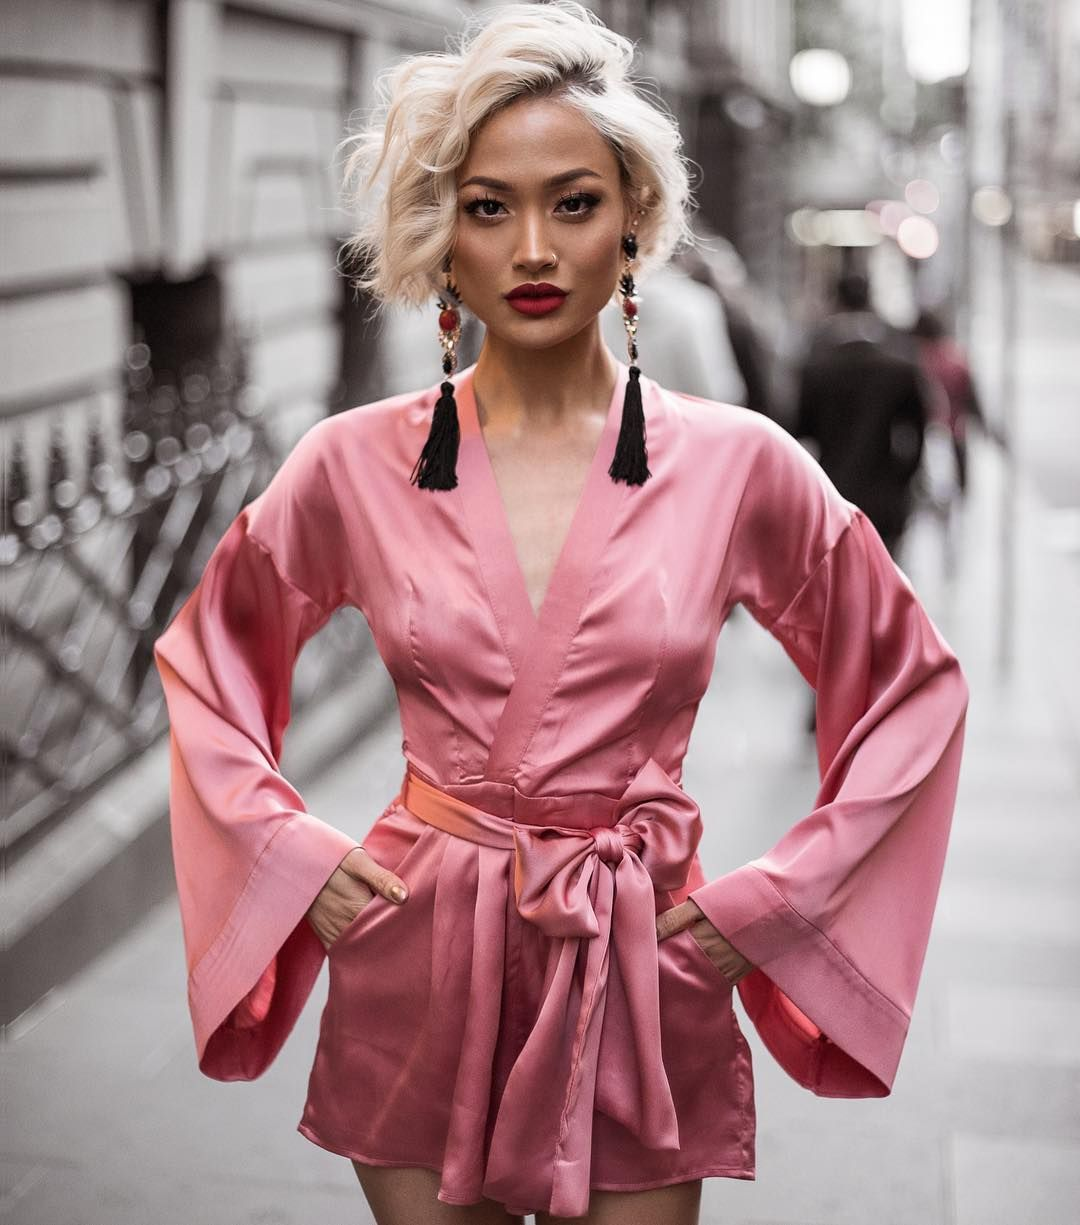 Micah Gianneli - That oriental vibe